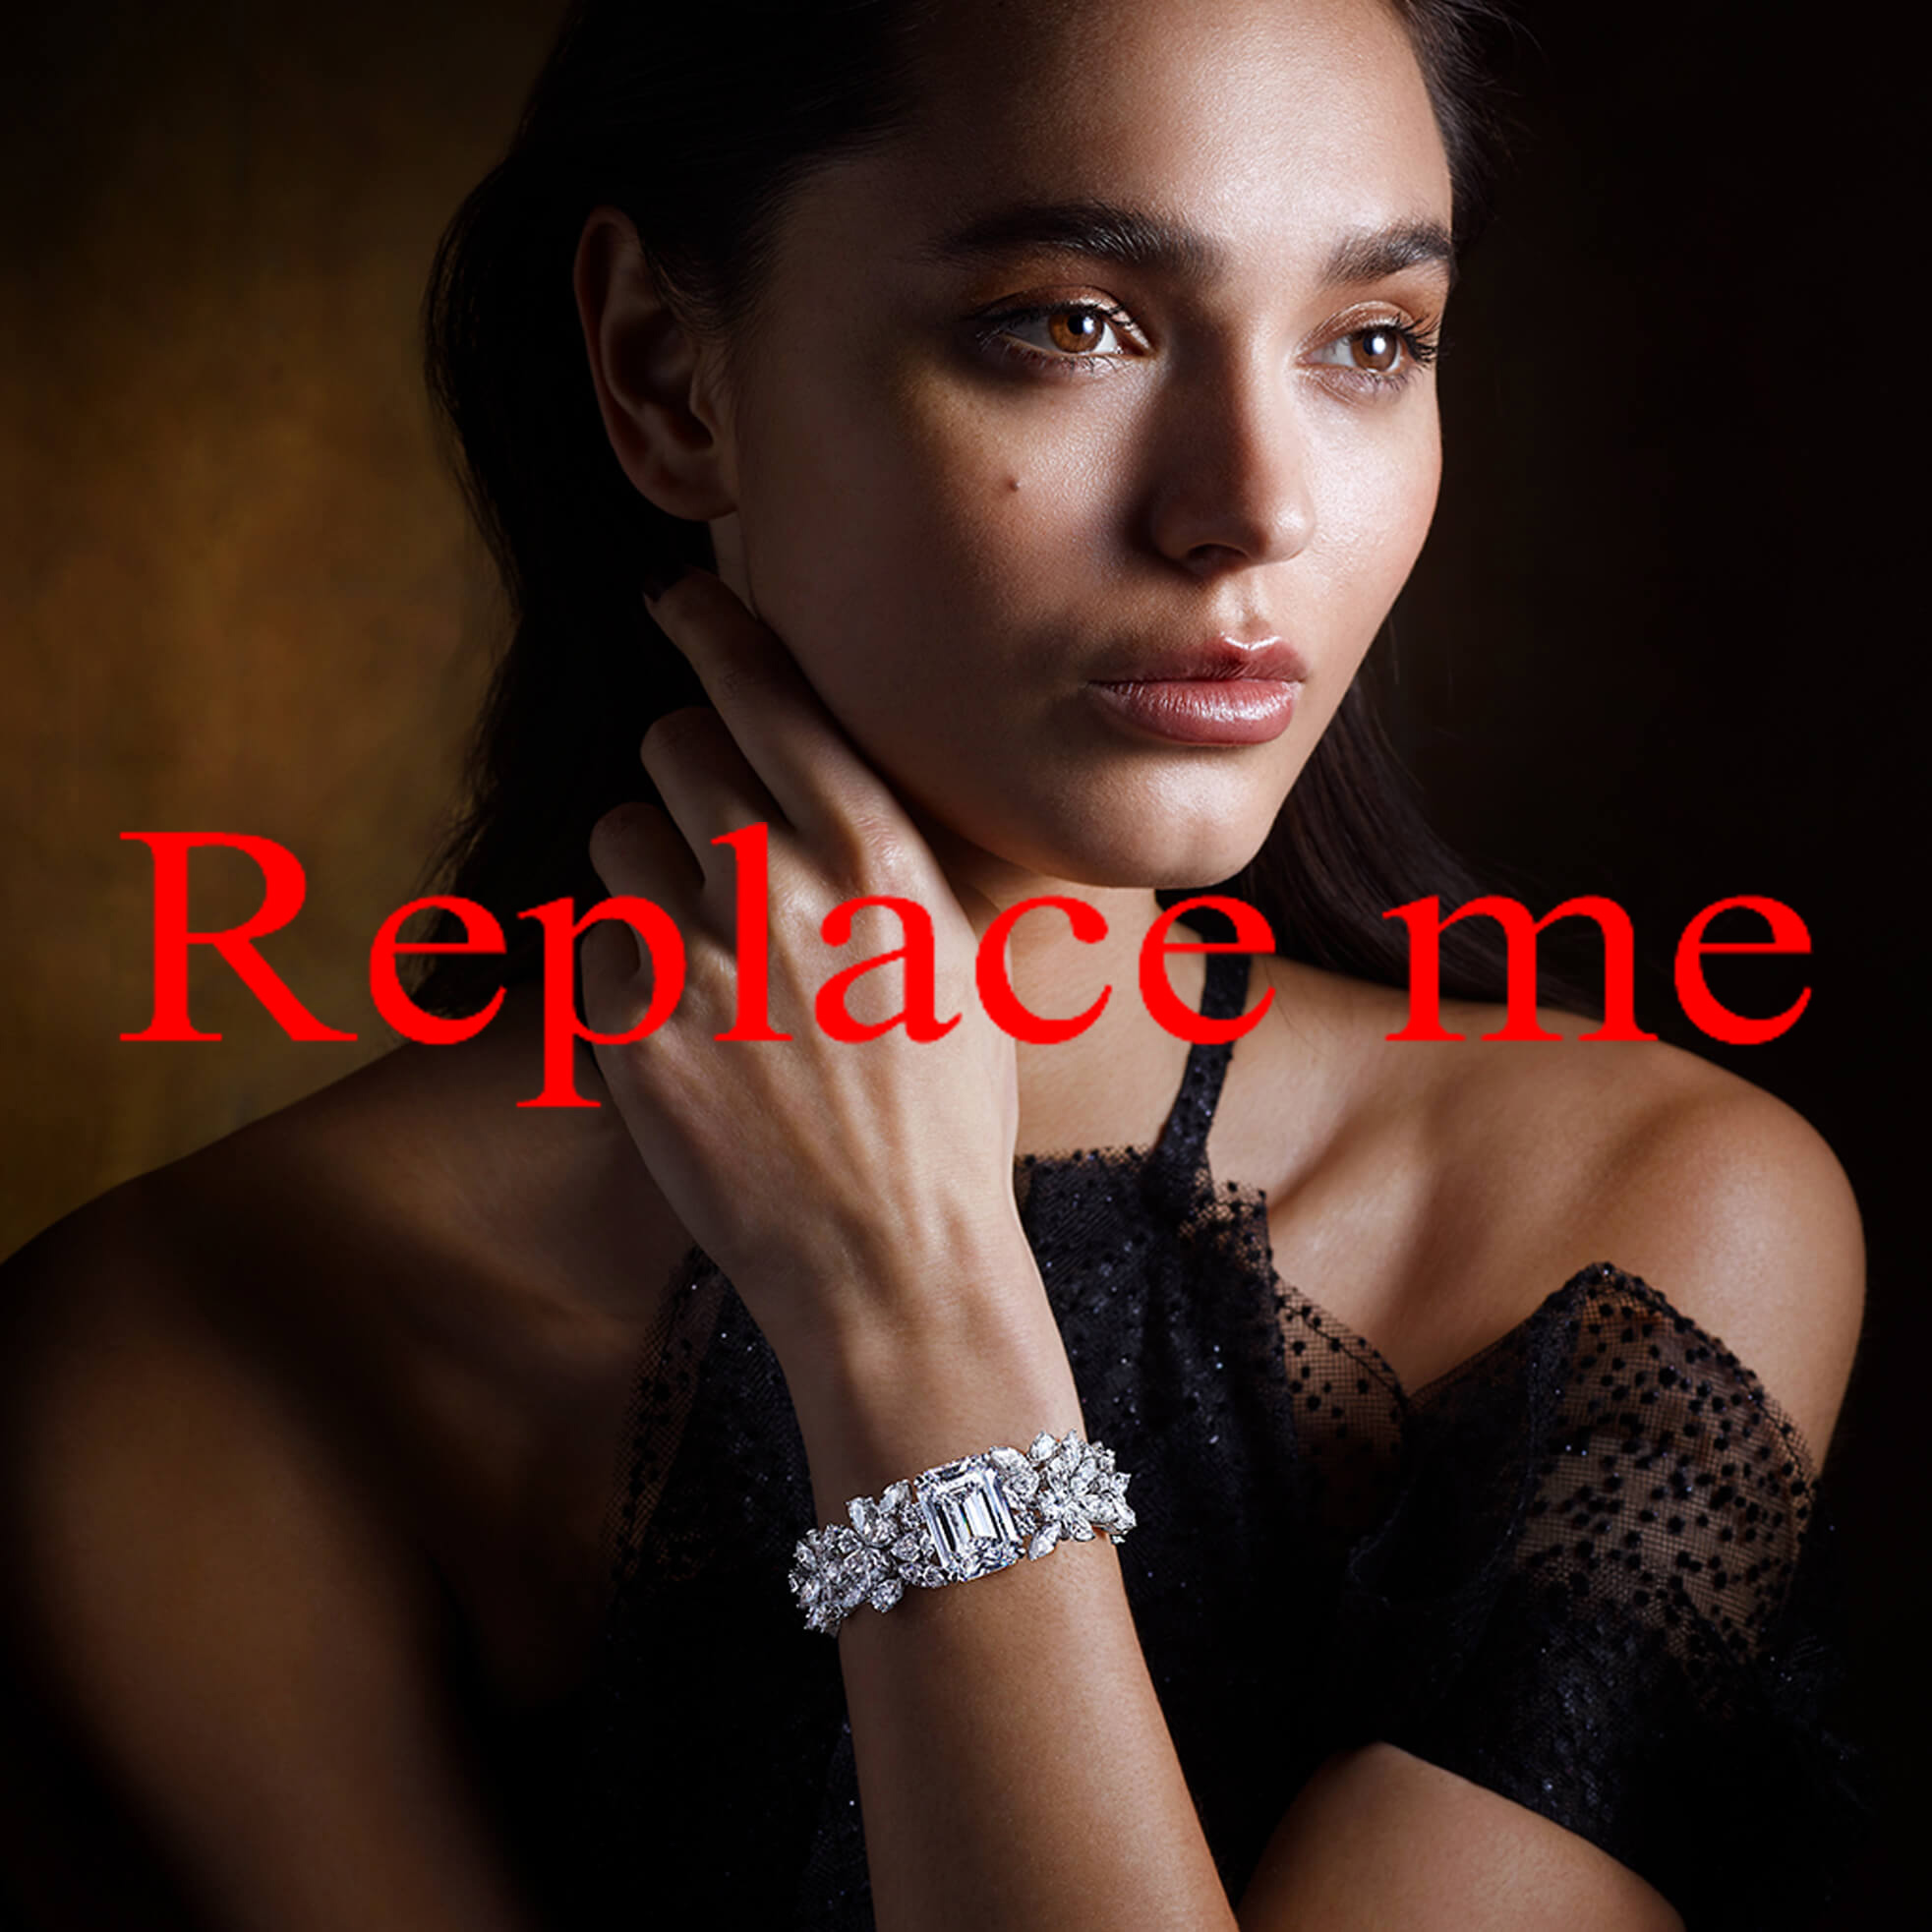 A-lady-wearing-a-Graff-diamond-bracelet-featuring-a-33.40-carat-emerald-cut-diamond-2000x2000